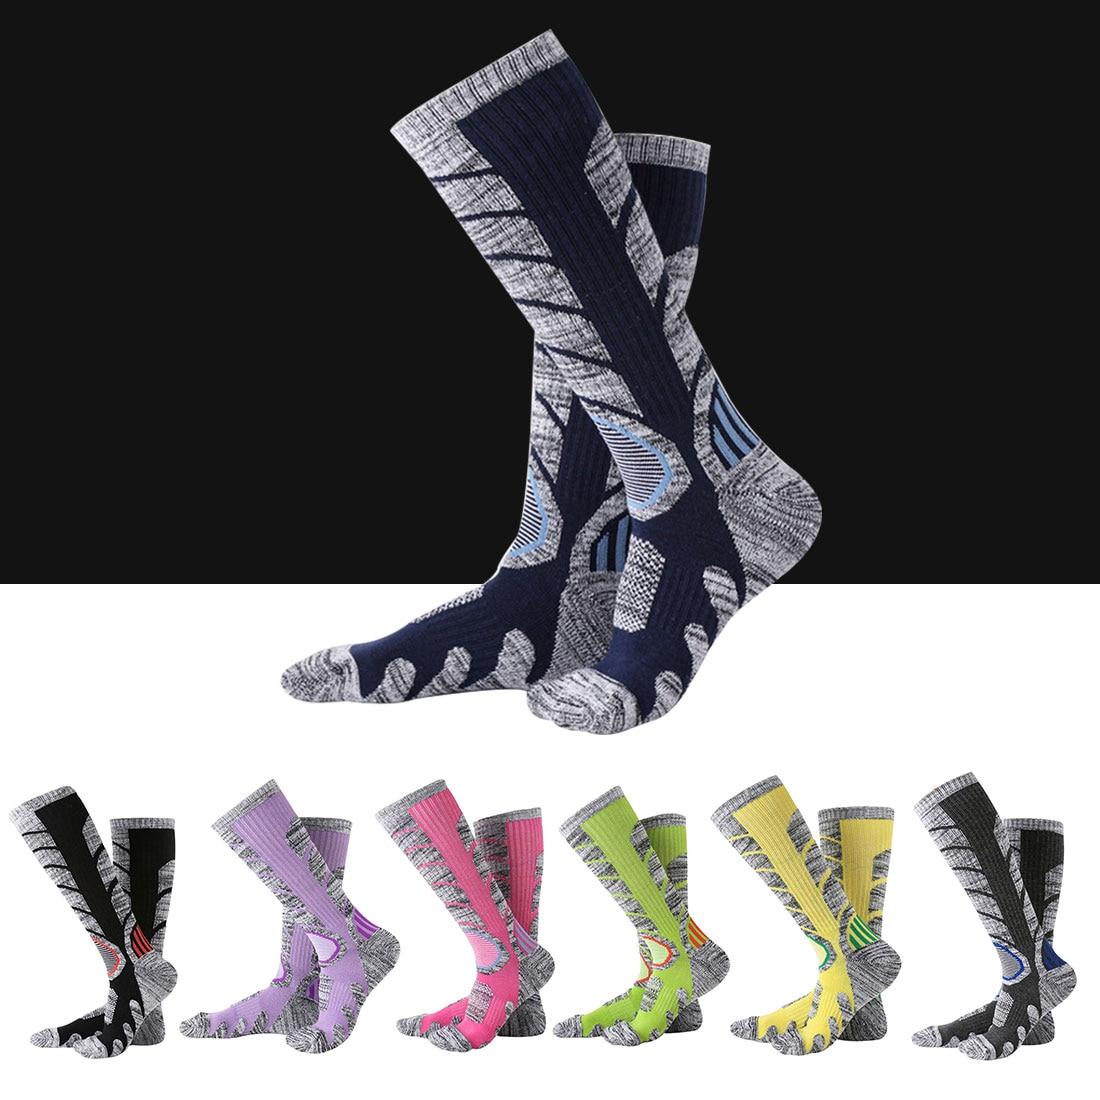 Winter Warm Men Women Thermal Ski Socks Thick Cotton Sports Snowboard Cycling Skiing Soccer Socks Leg Warmers Long Socks